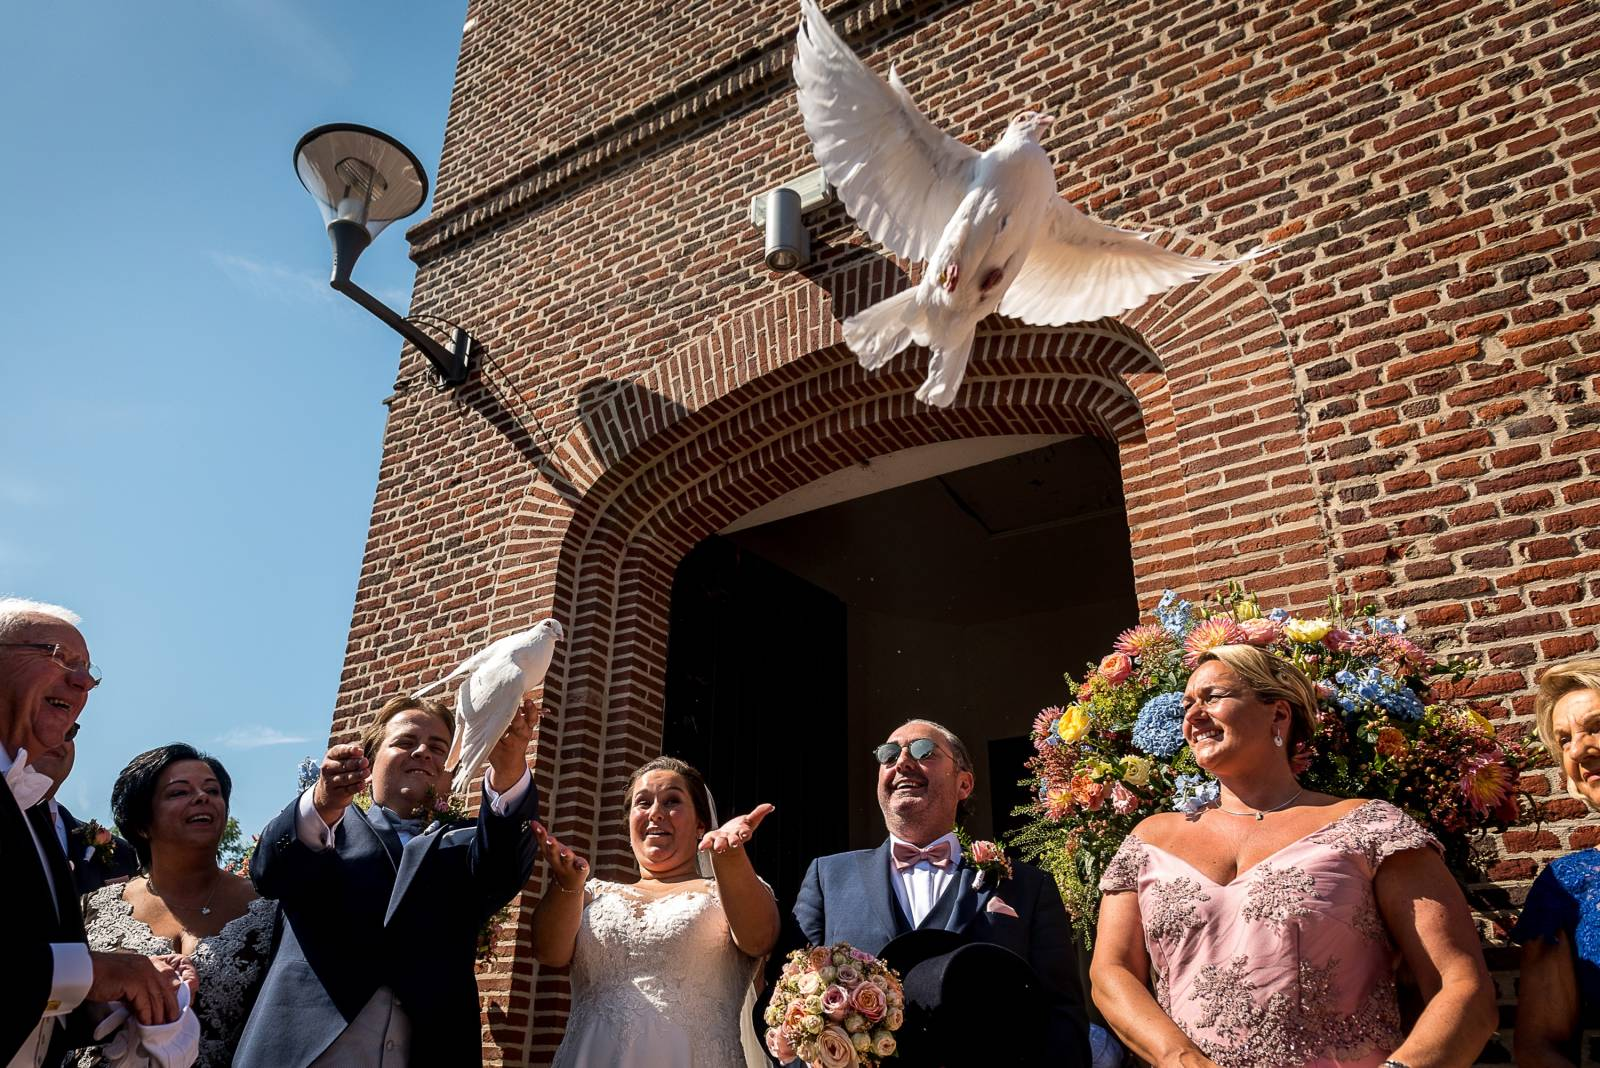 Fotografie Melody - Huwelijksfotograaf - Trouwfotograaf - House of Weddings - 11